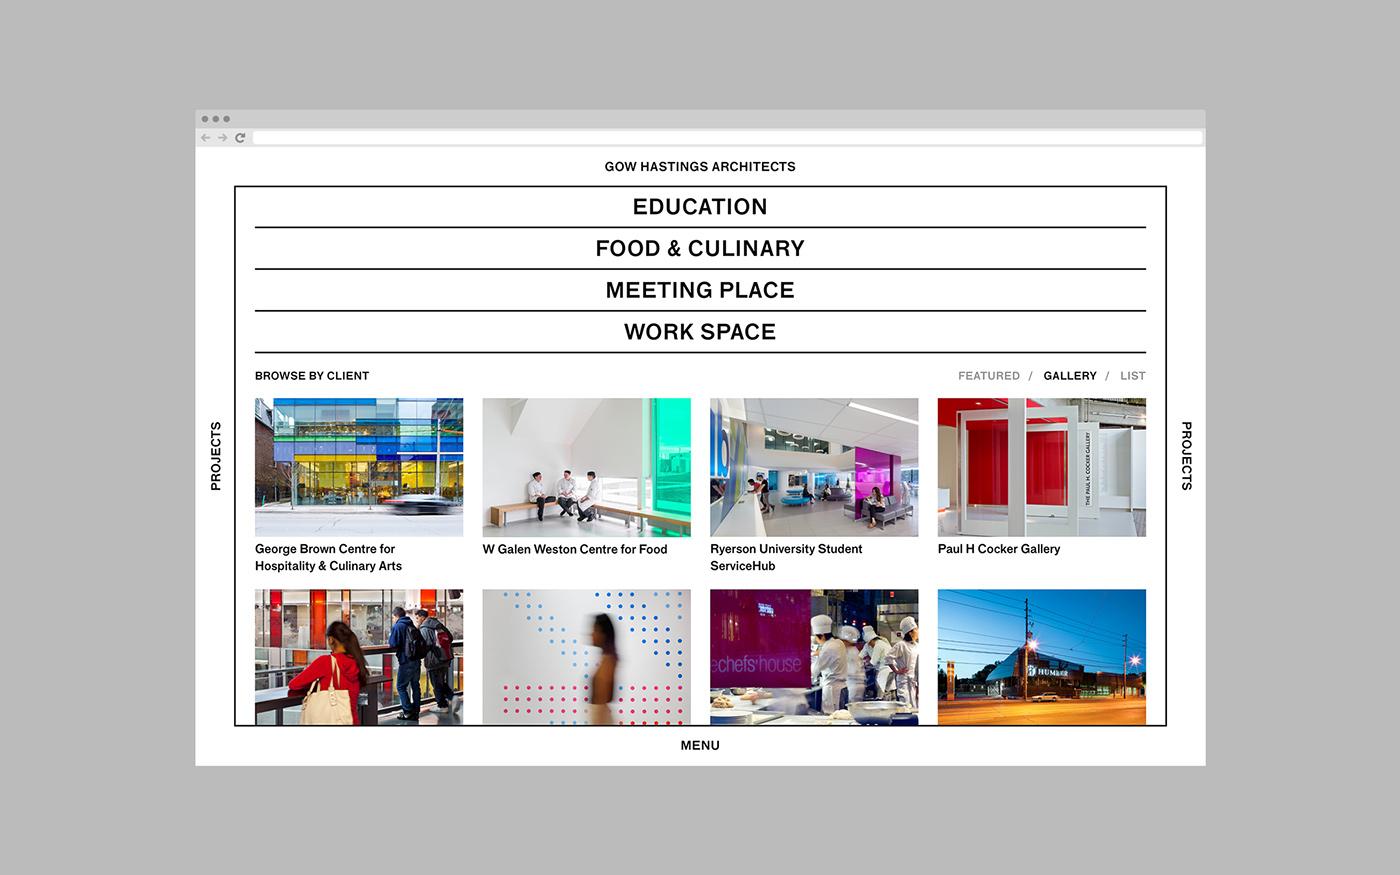 architecture,architects,Responsive Design,responsive website,gow hastings,Creative navigation,portfolio website